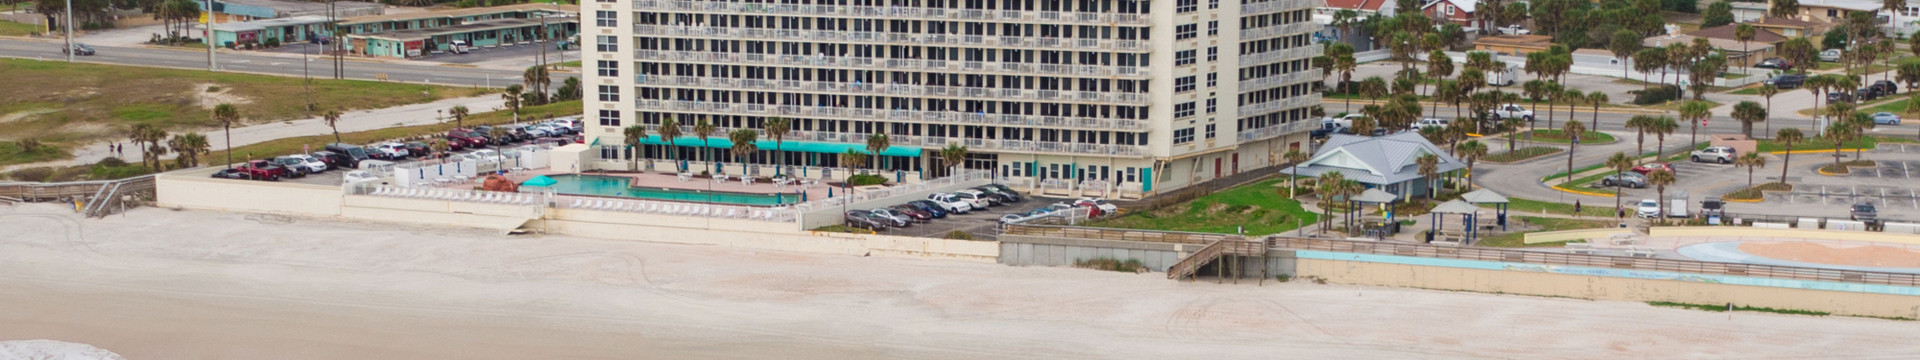 Daytona Beach Hotel Deals - Harbour Beach Resort Daytona Beach Florida